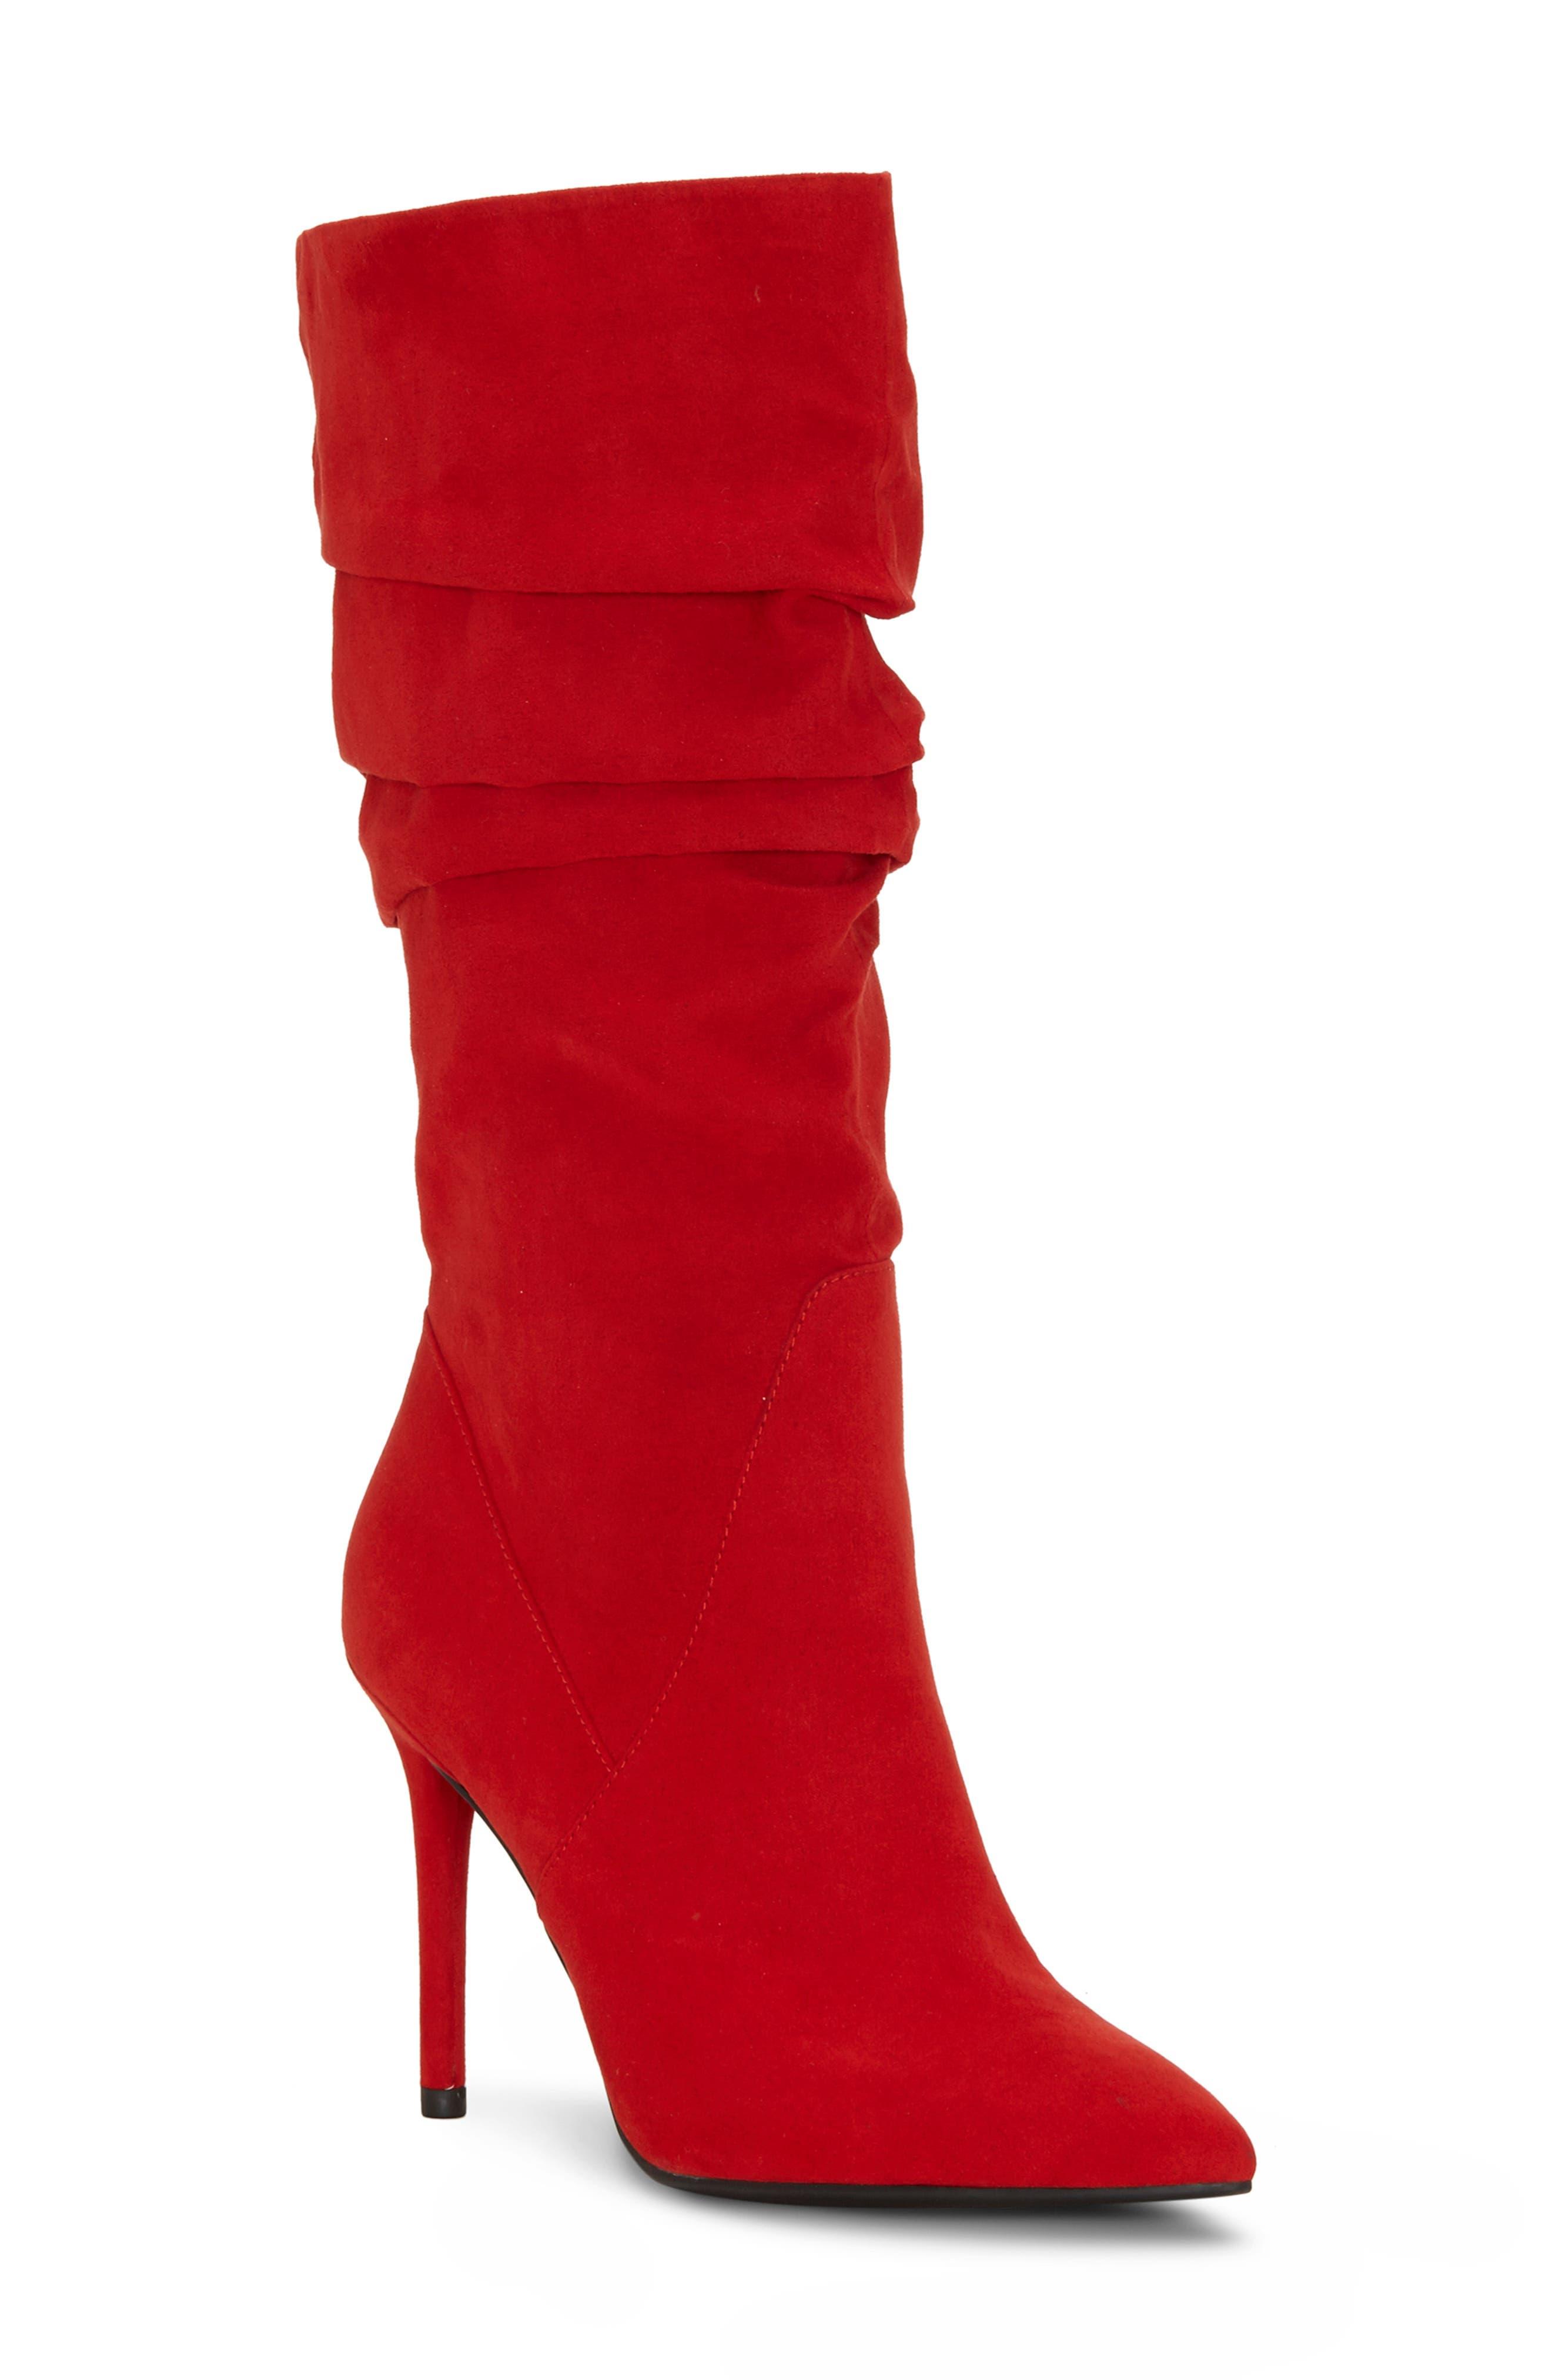 Jessica Simpson Larsa Boot, Red